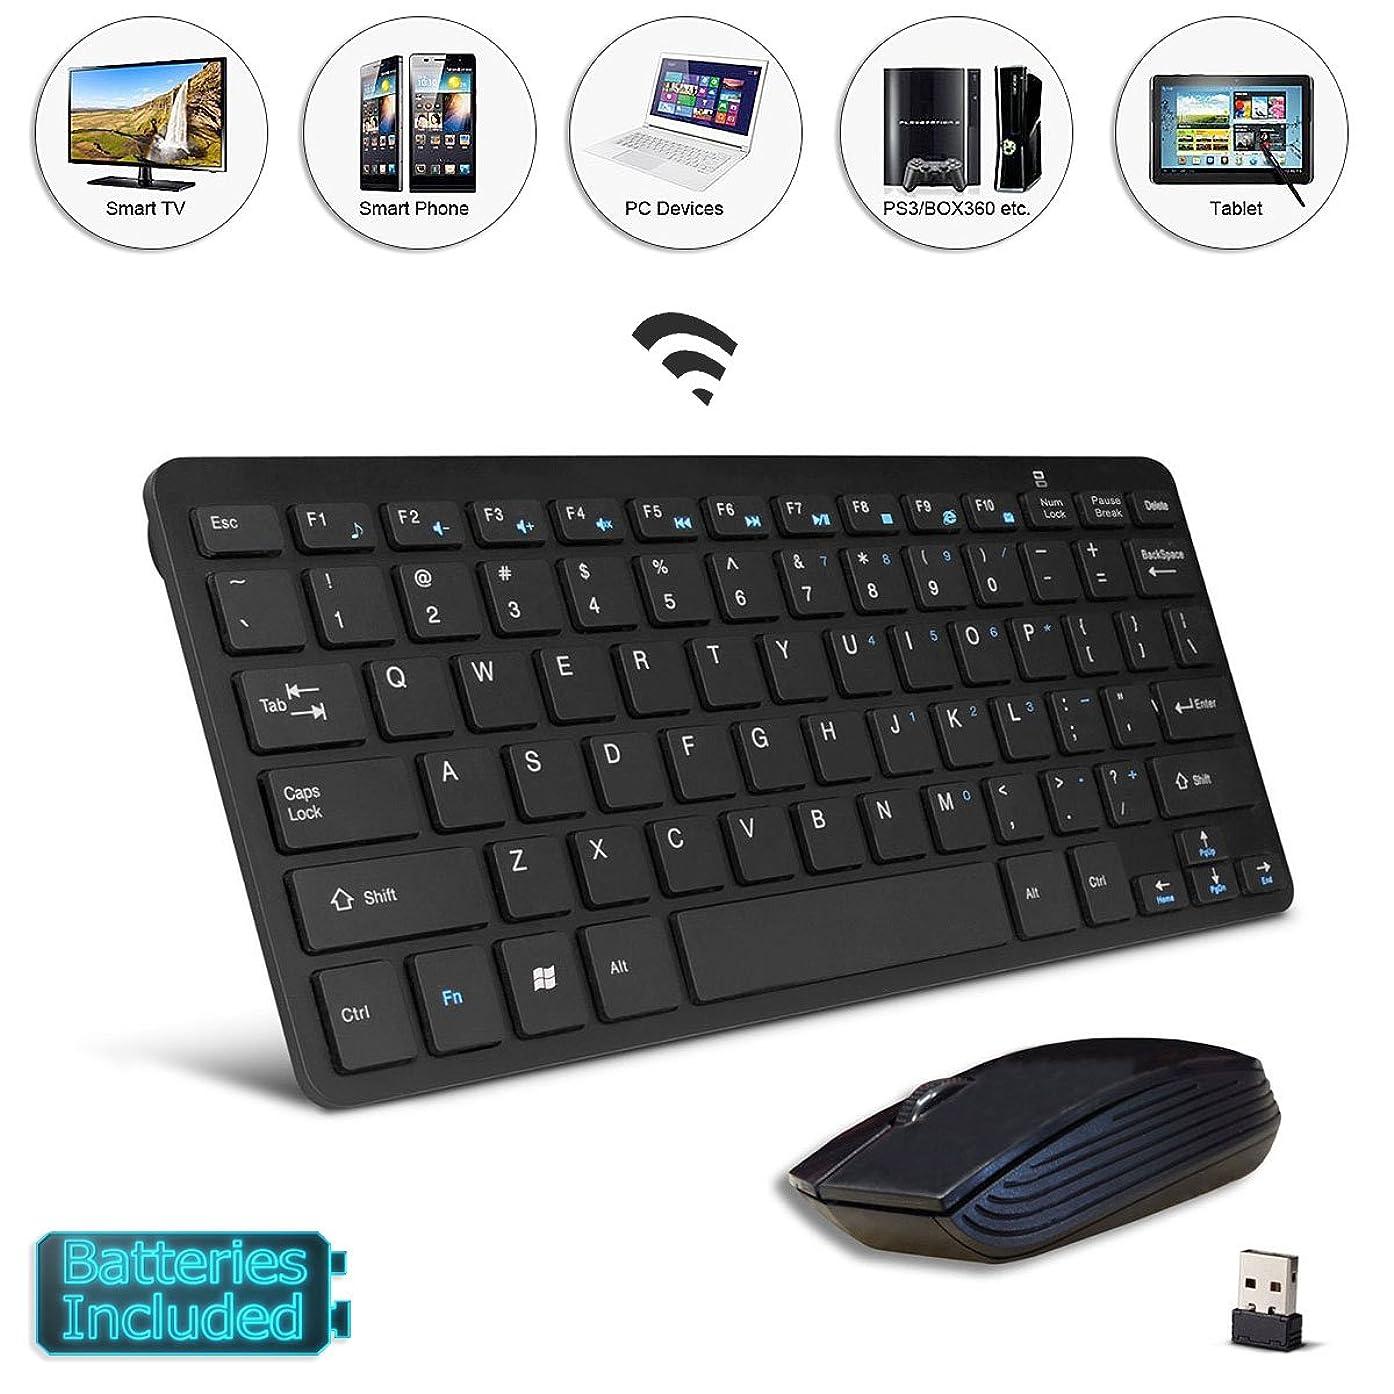 Black Wireless Mini Ultra Slim Keyboard and Mouse for Smart TV Blaupunkt 43/1370 et 43 / 137ZX & 49 / 148ZX